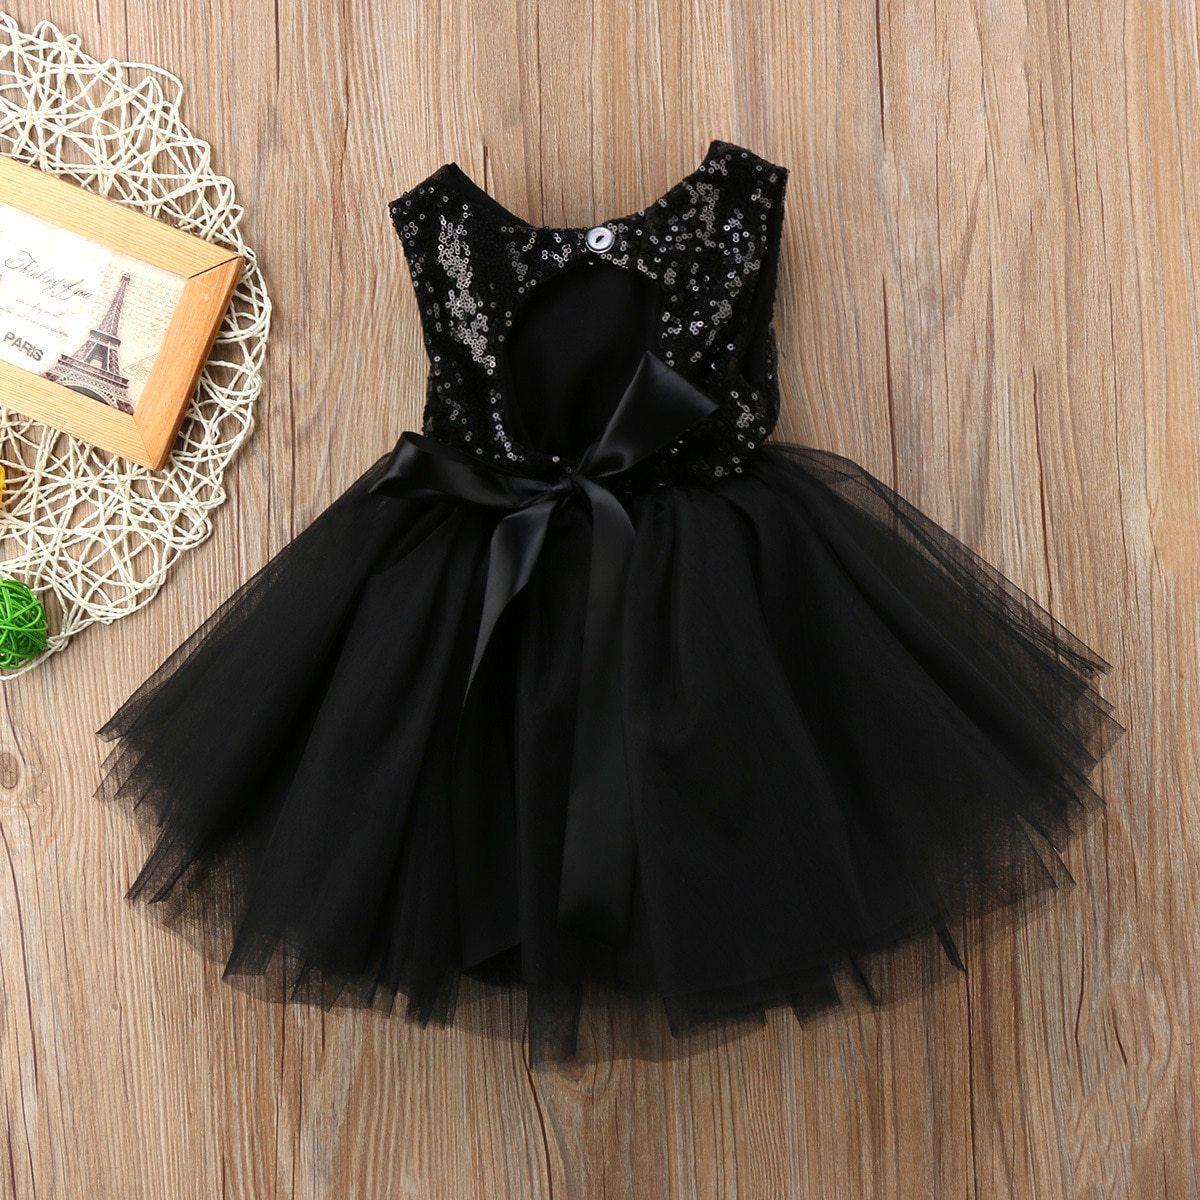 Backless Princess Dresses For Baby Kids Summer Party Clothes In 2021 Kids Designer Dresses Dresses Kids Girl Girls Bridesmaid Dresses [ 1200 x 1200 Pixel ]